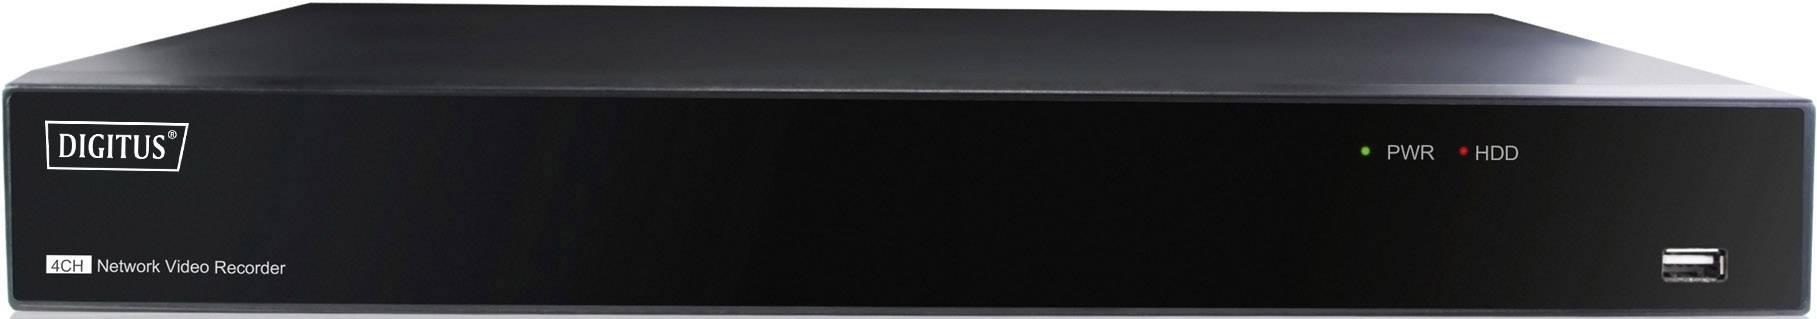 Síťový IP videorekordér (NVR) pro bezp. kamery Digitus Plug-N-View DN-16150_2, 4kanálový